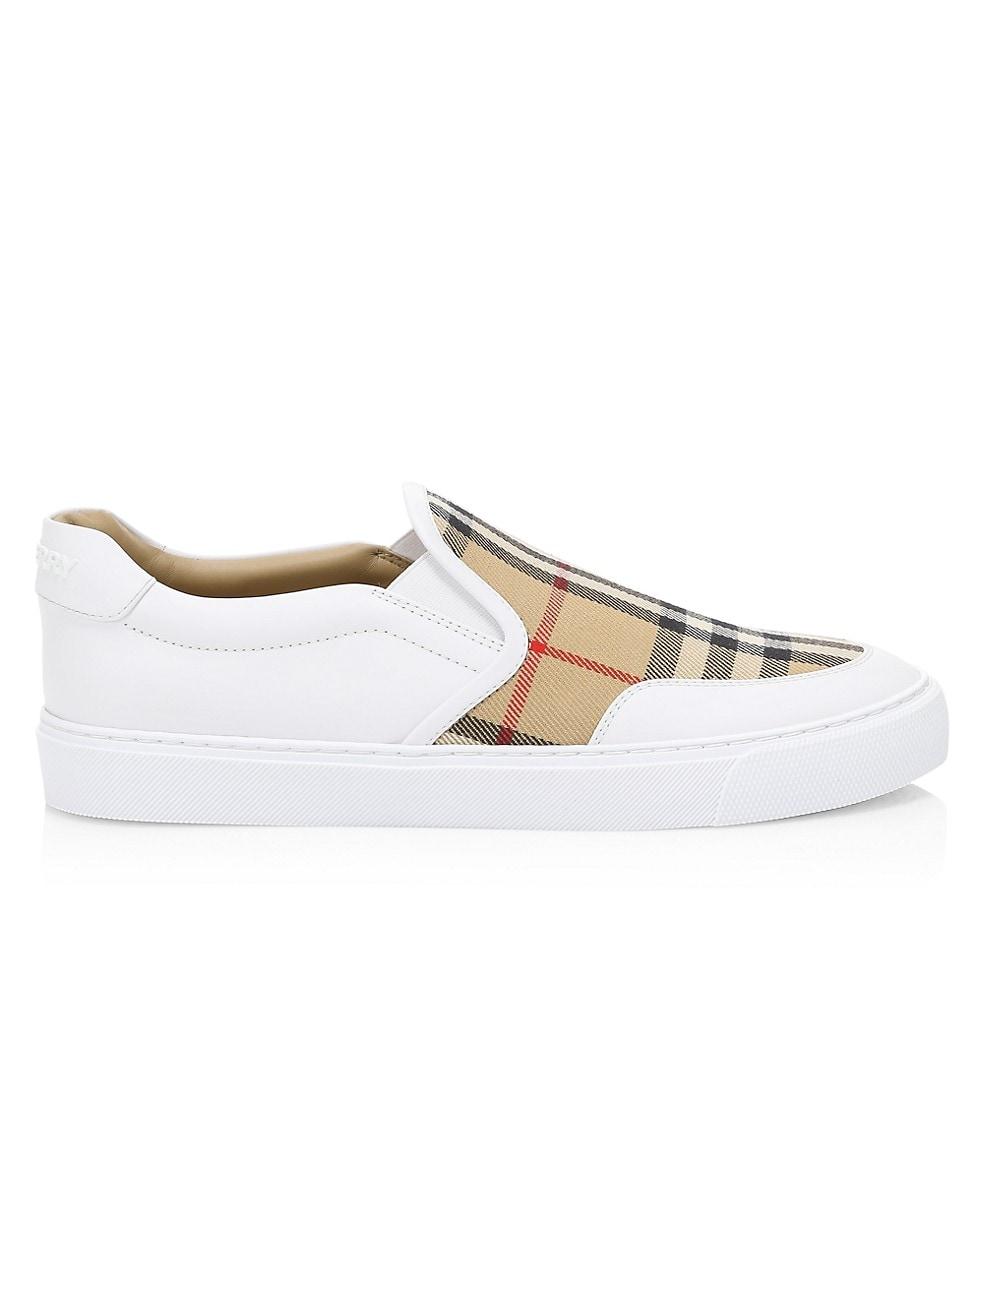 Burberry Salmond Vintage Check Slip-on Sneakers